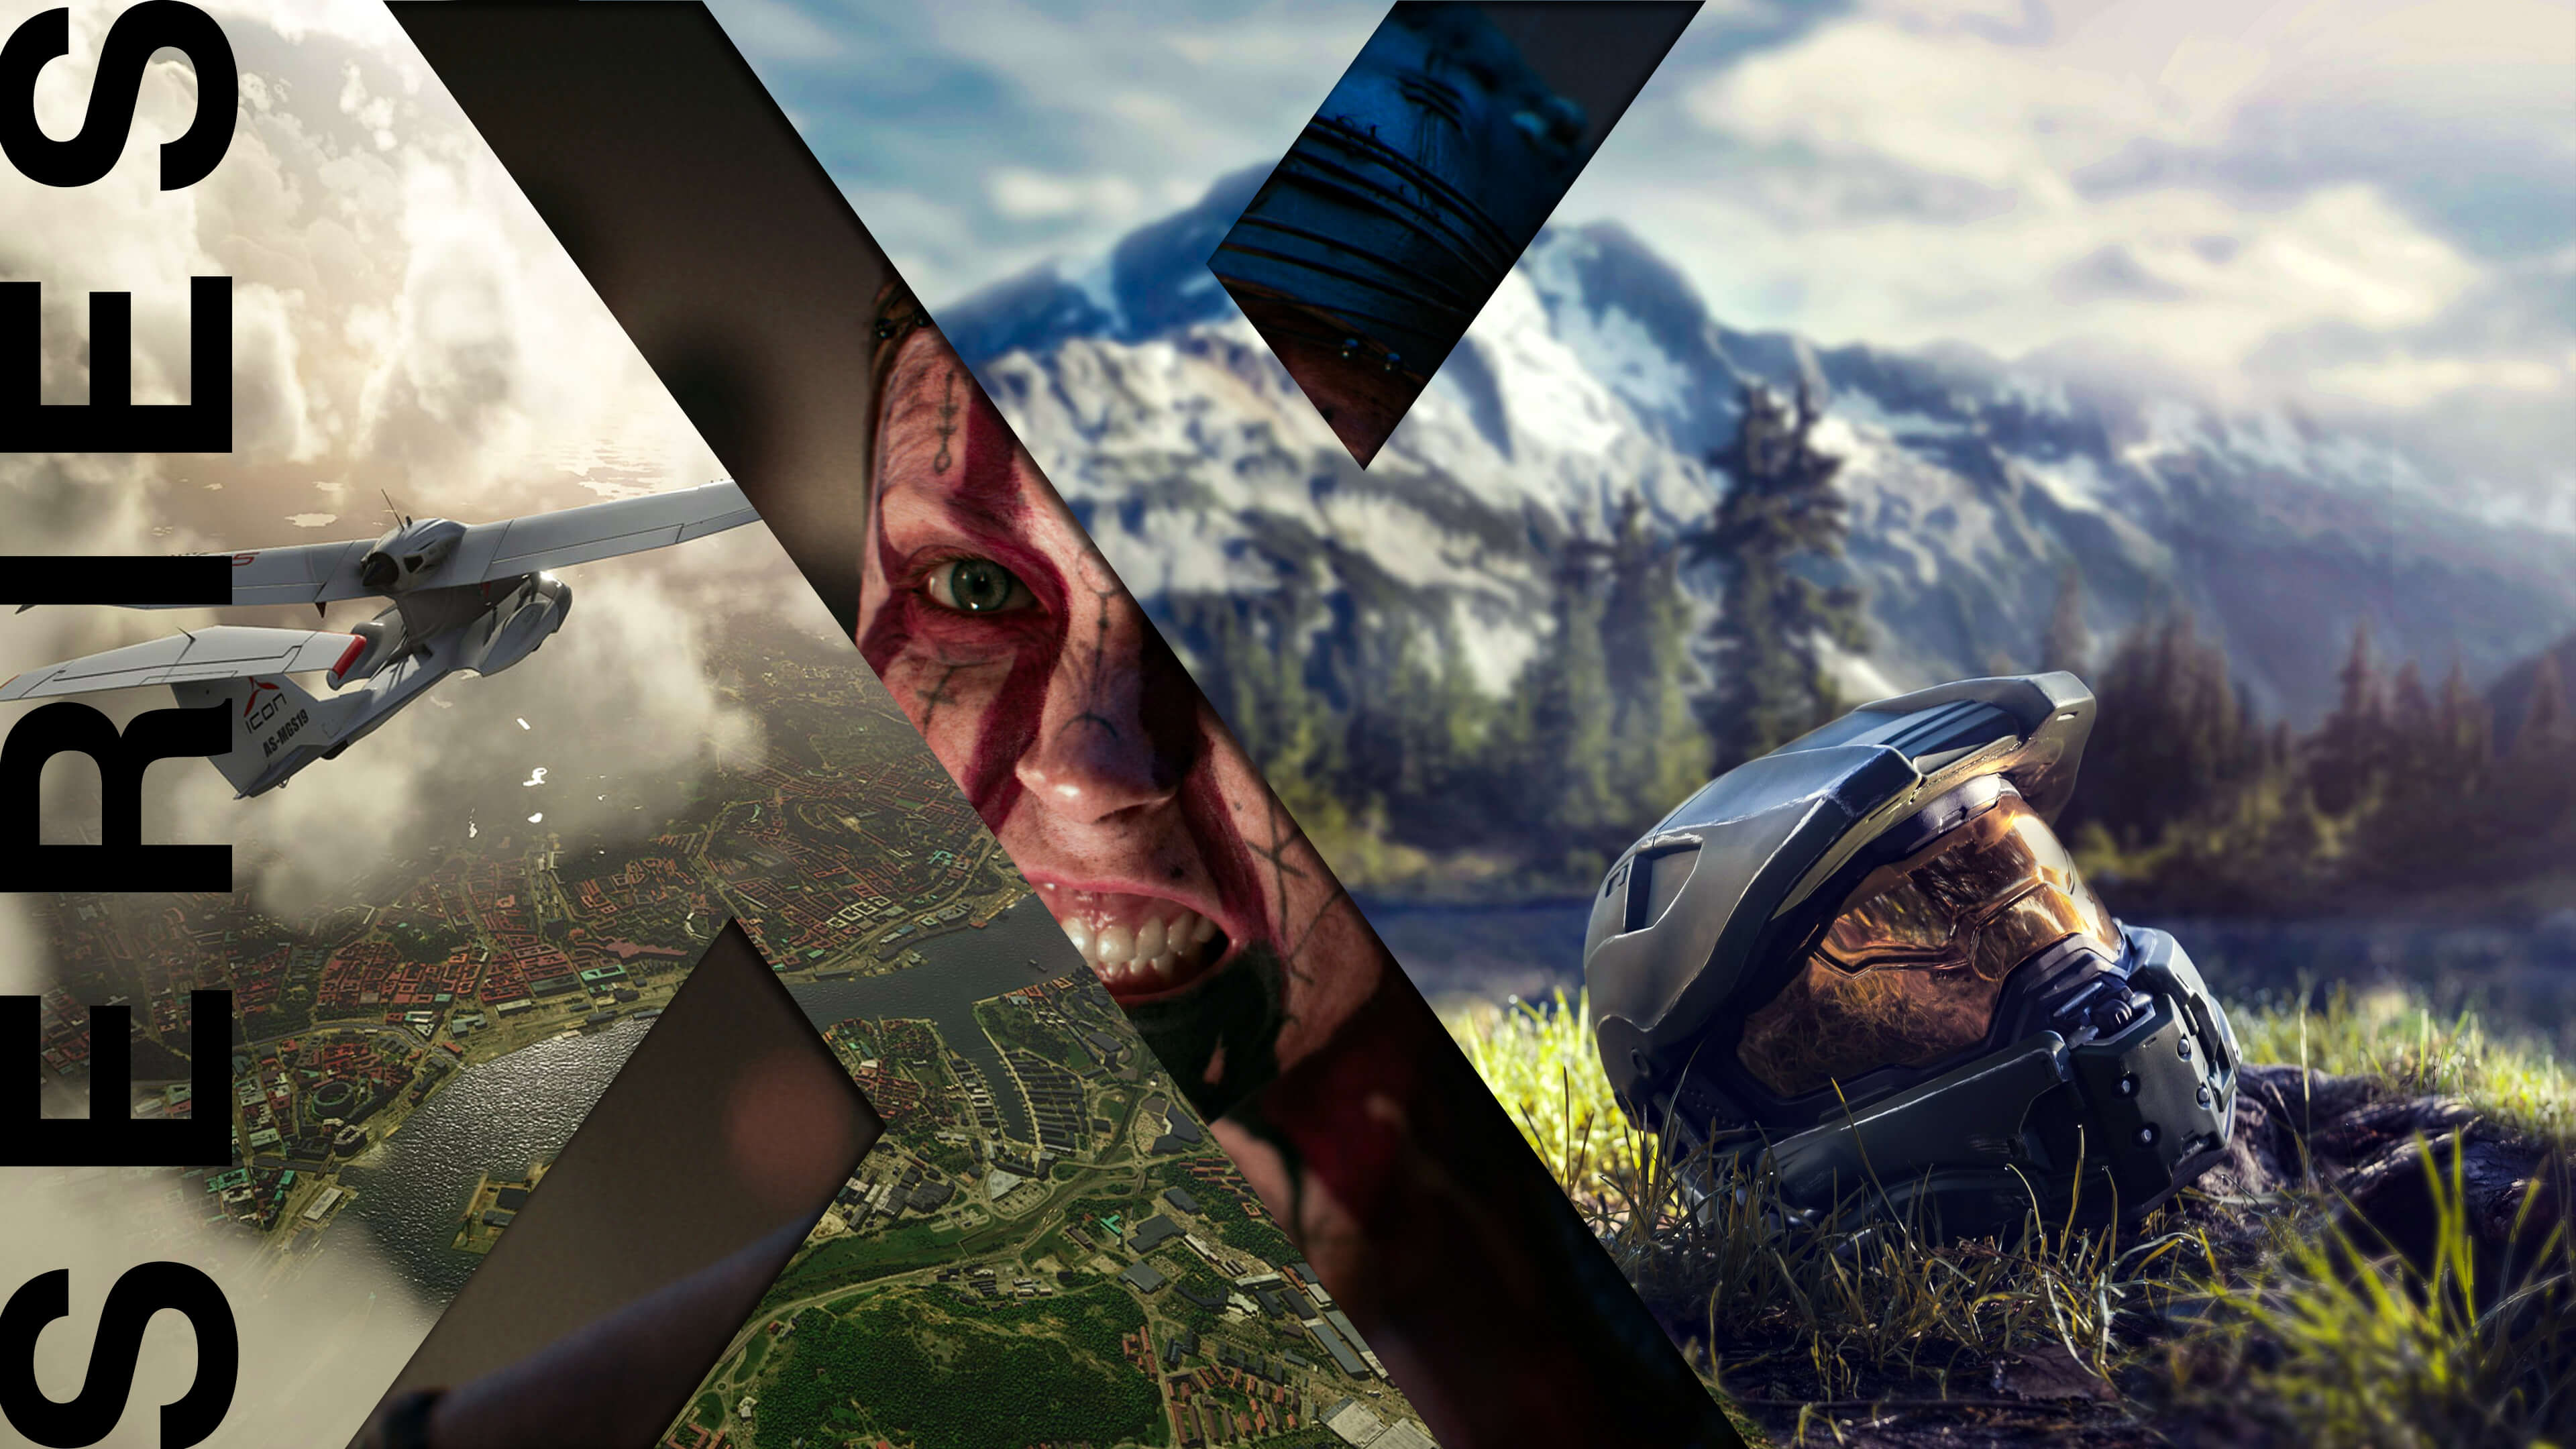 Xbox Series X Games By Petur Hardarson Wallpapers Wallpaperhub